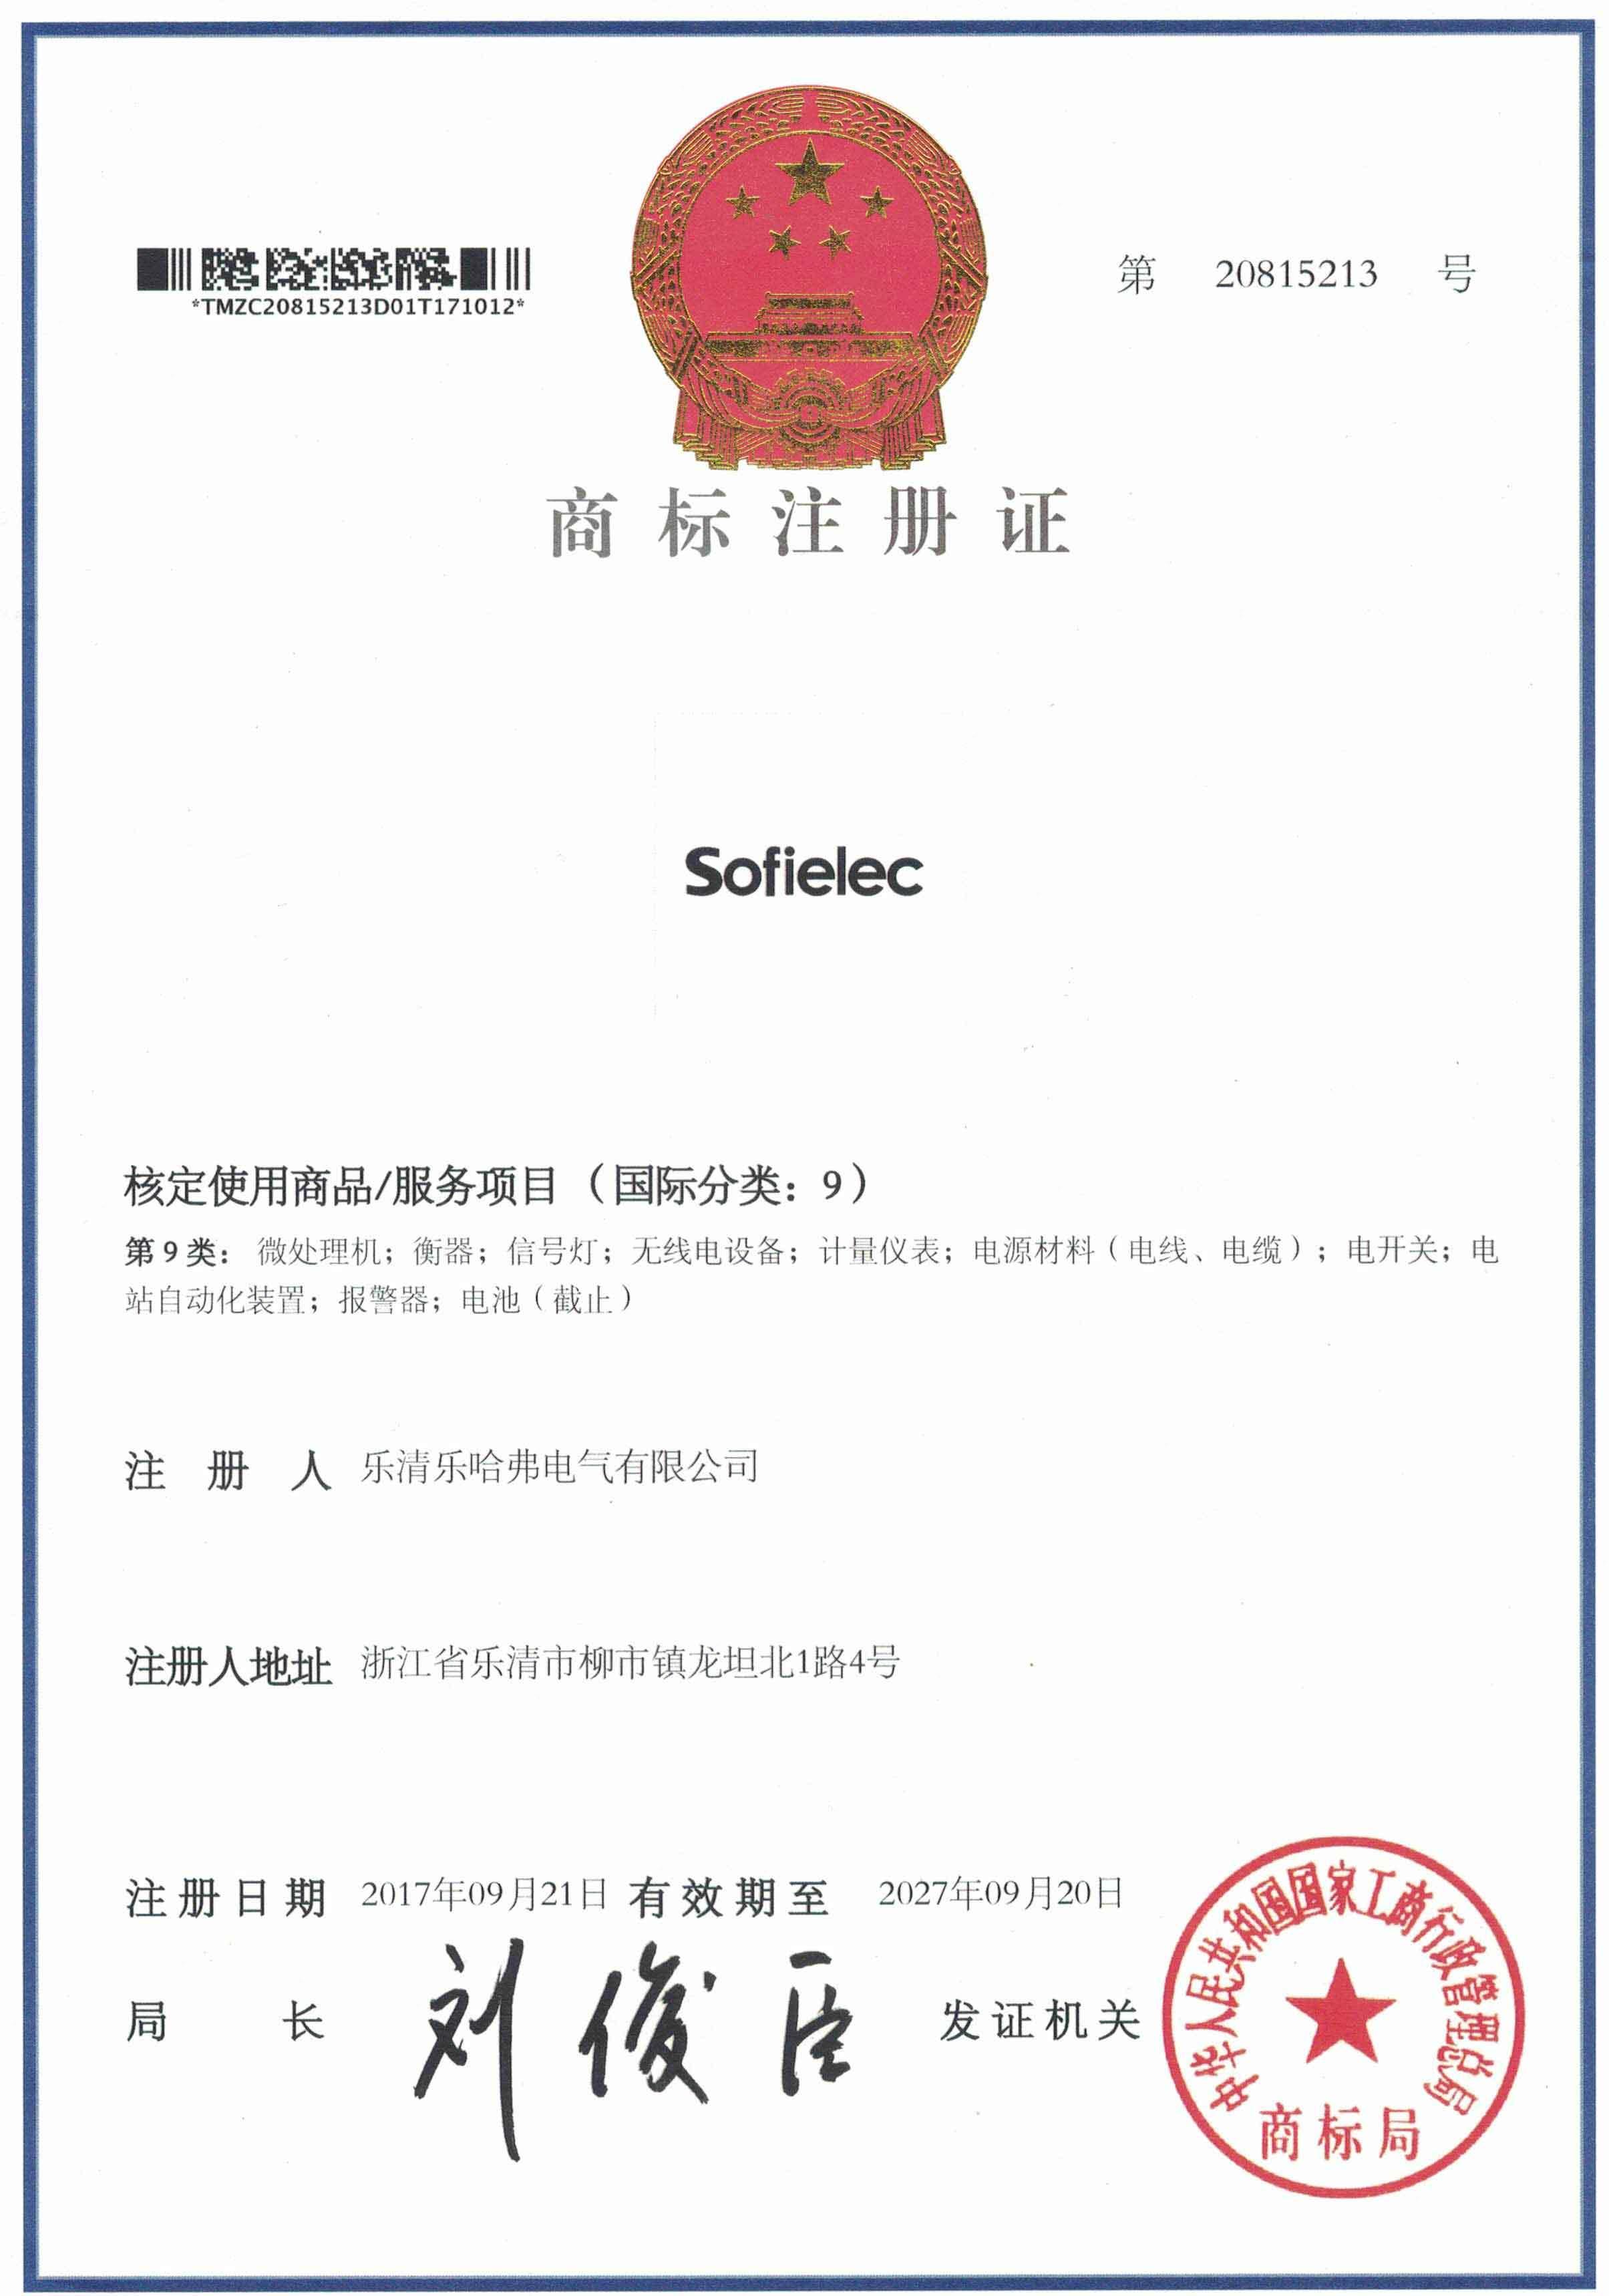 Sofielec Trademark registration certificate